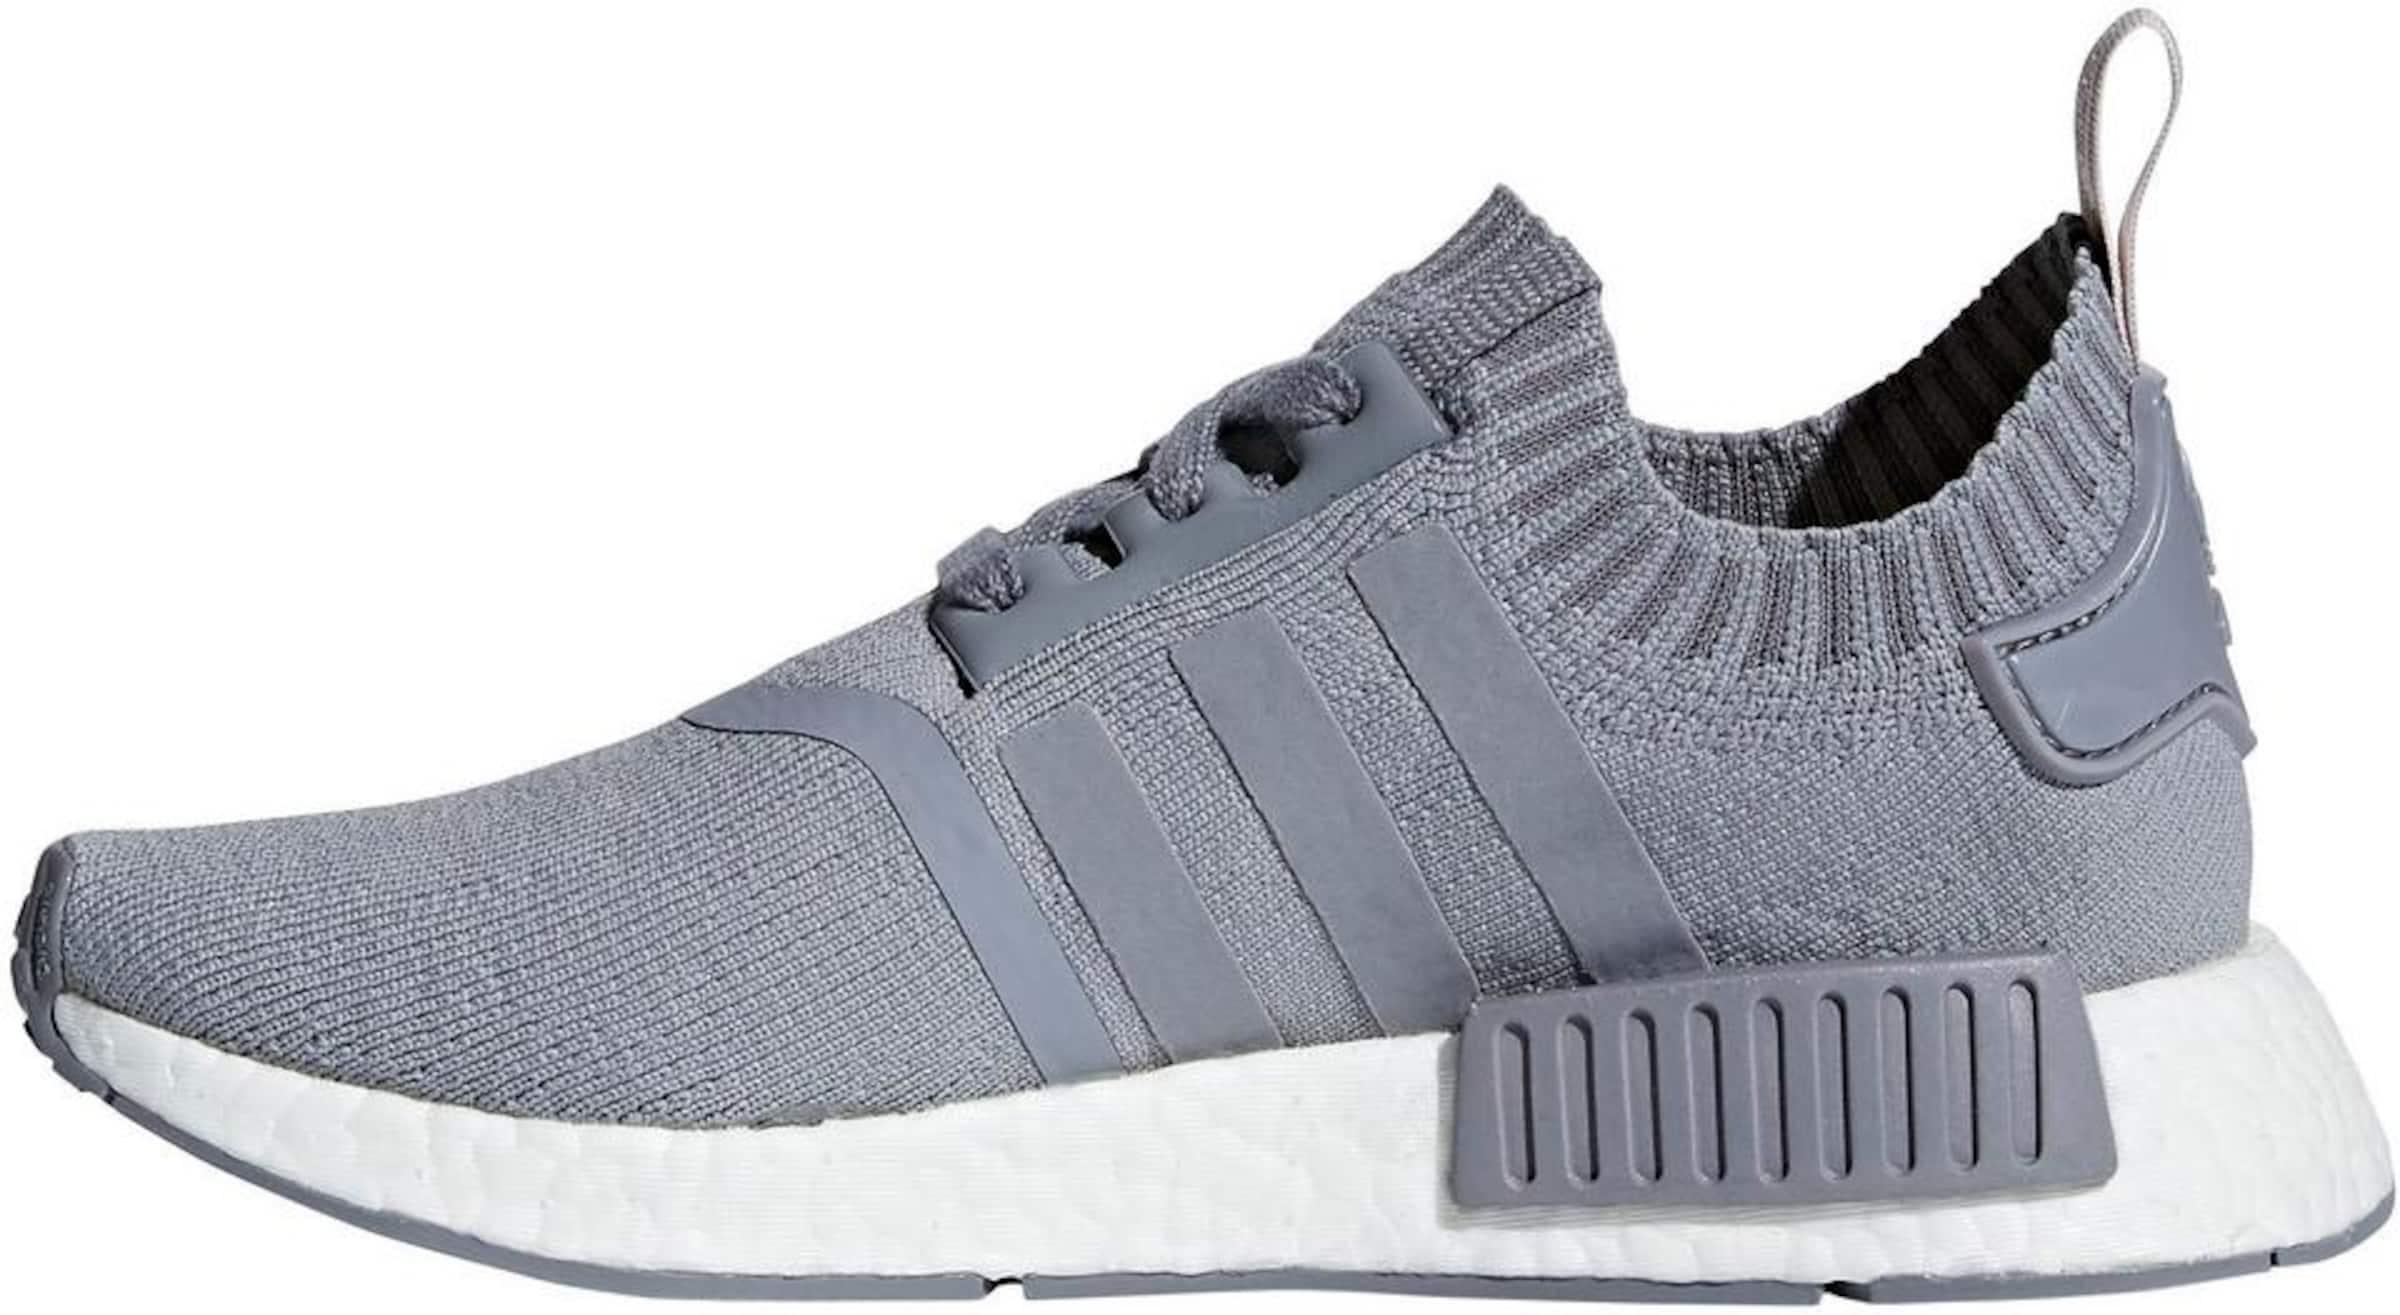 ADIDAS ORIGINALS Sneaker  NMD R1 Primeknit W